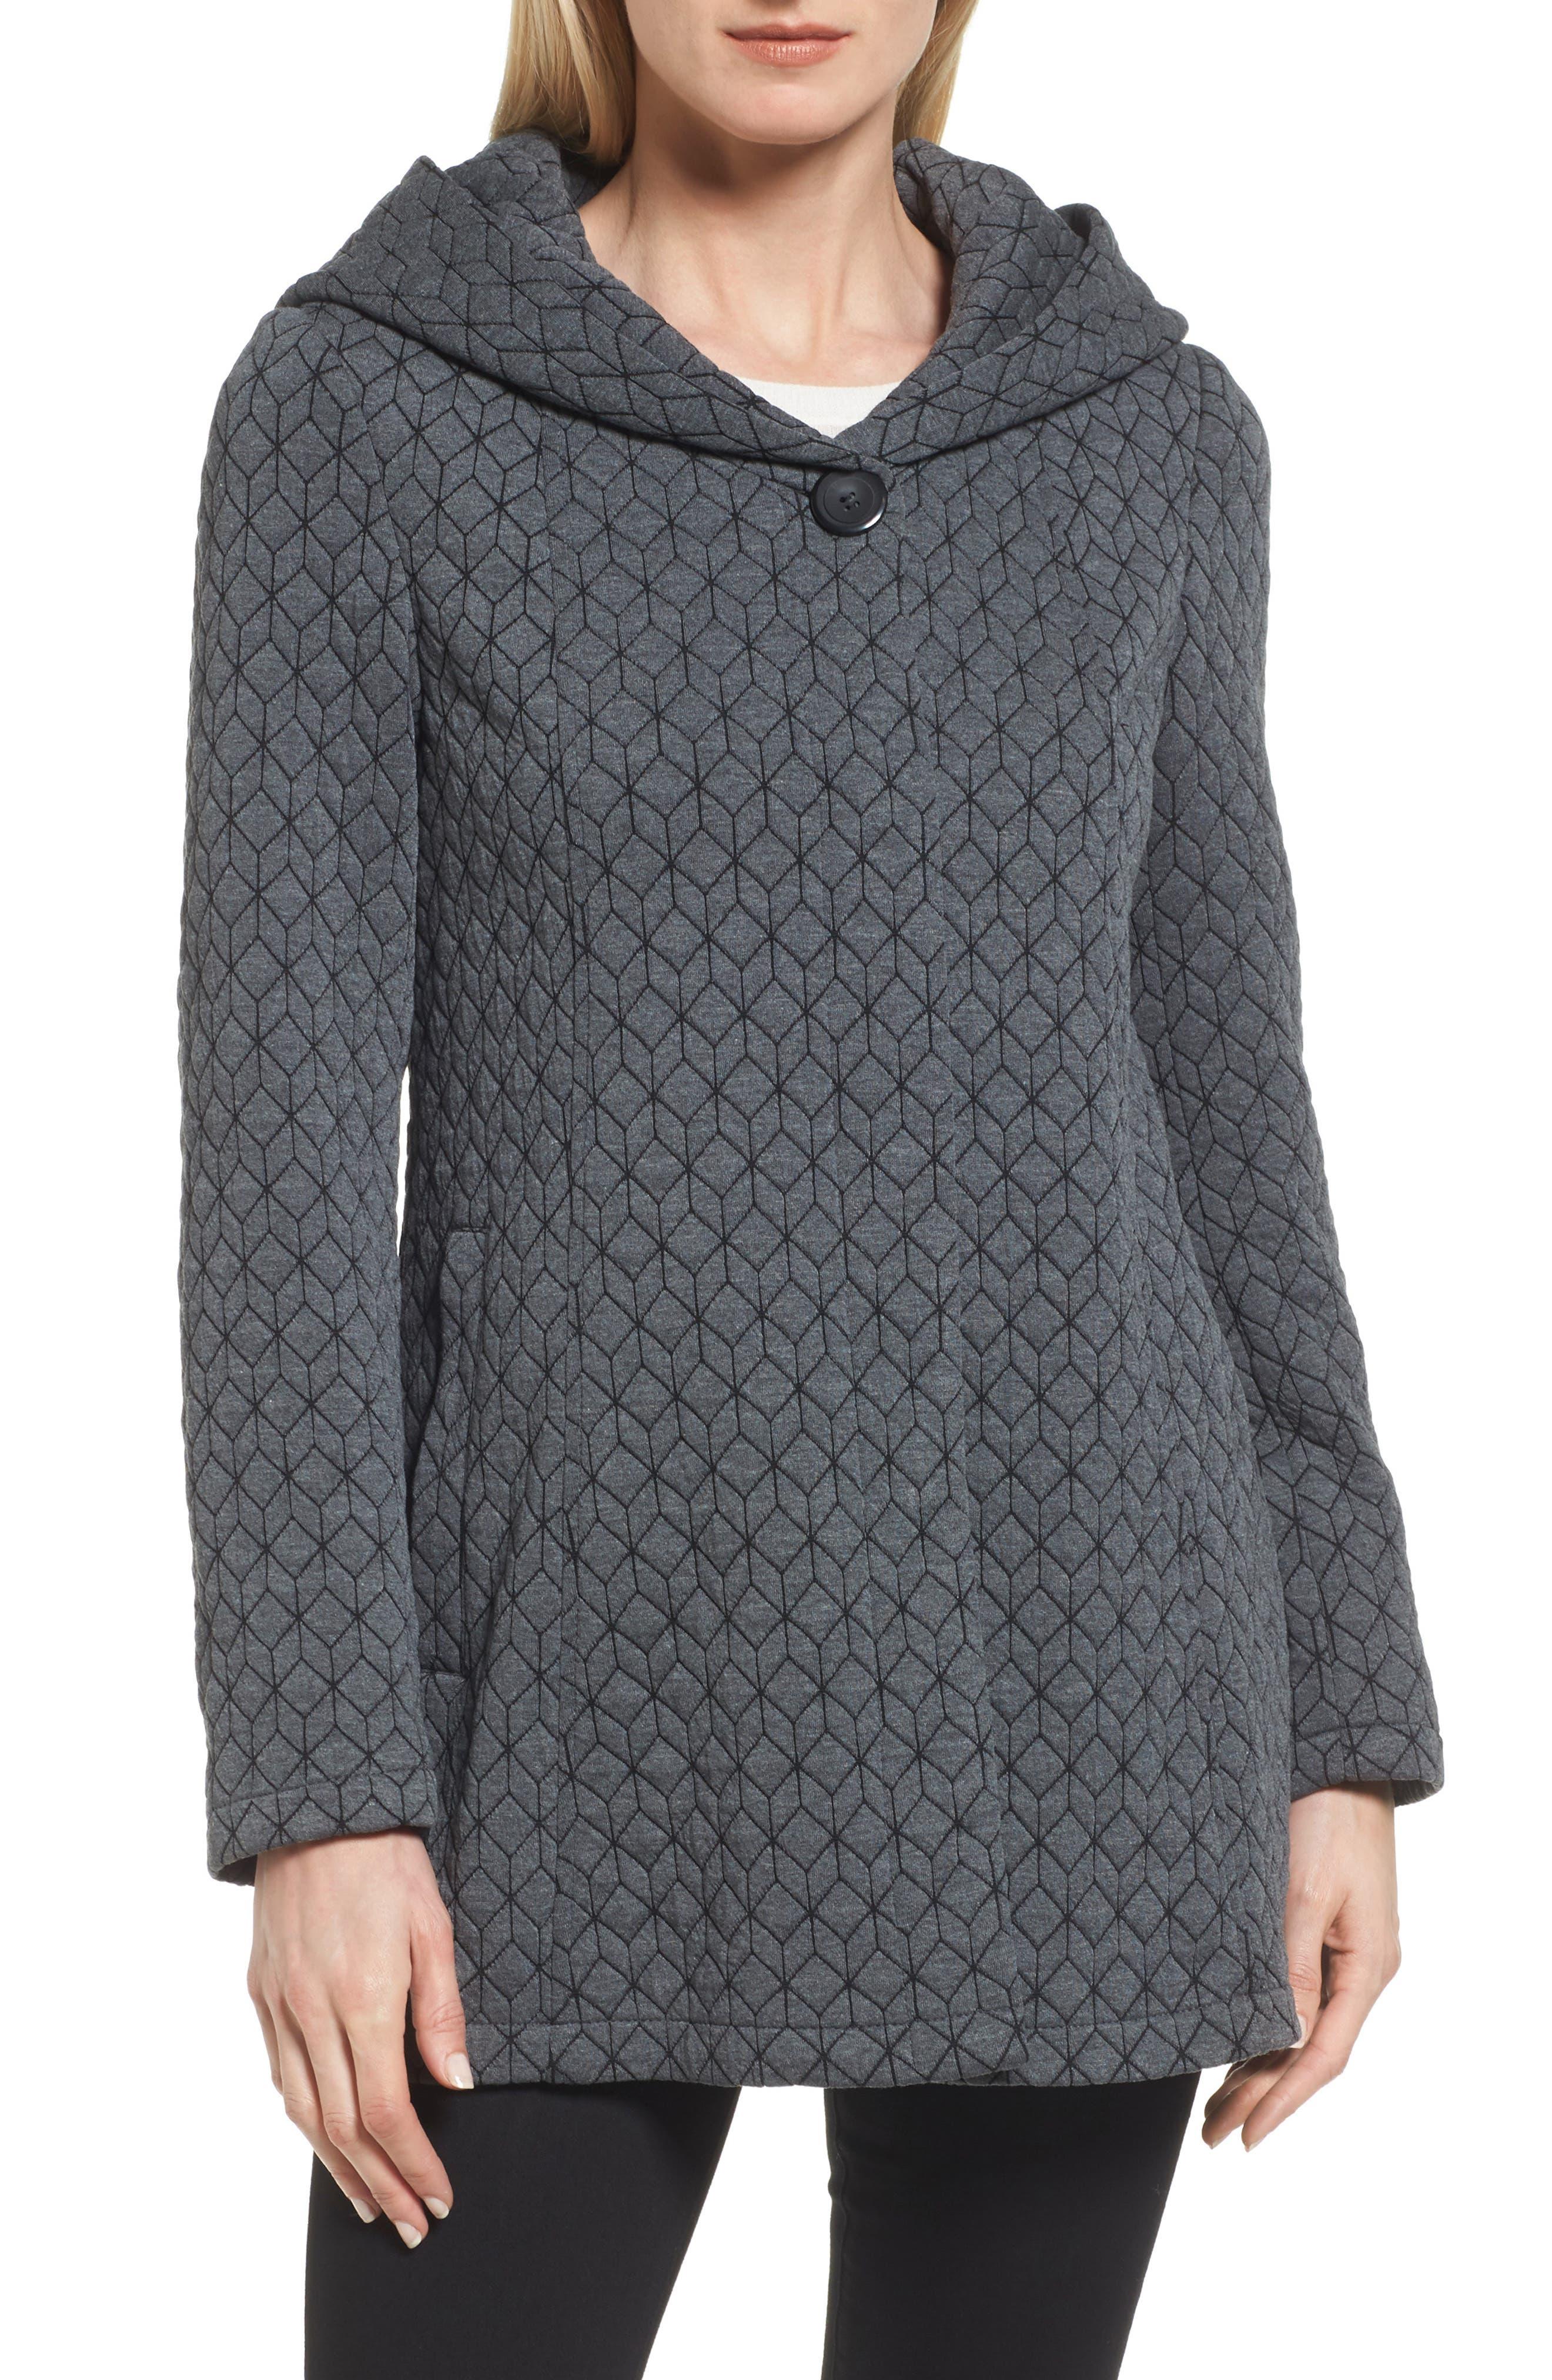 Cozy Knit Coat,                             Main thumbnail 1, color,                             020